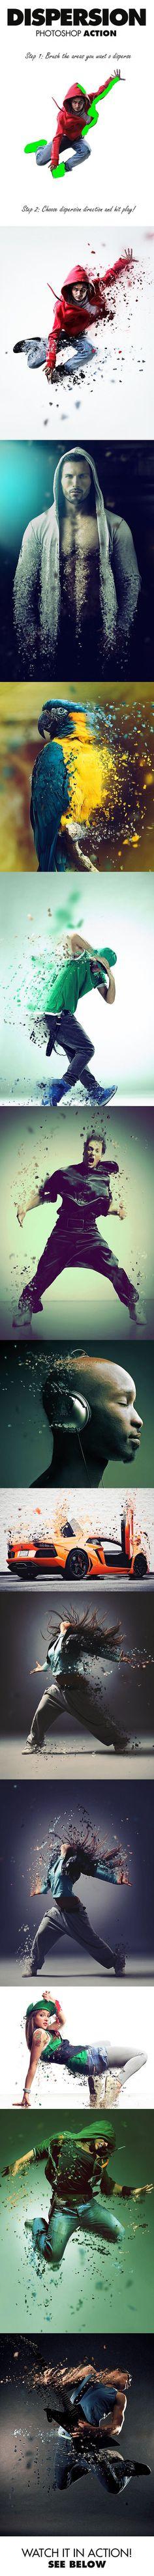 Dispersion Photoshop Action (Photo Effect)  Download **HERE**: https://graphicriver.net/item/dispersion-photoshop-action/7905698?ref=KlitVogli